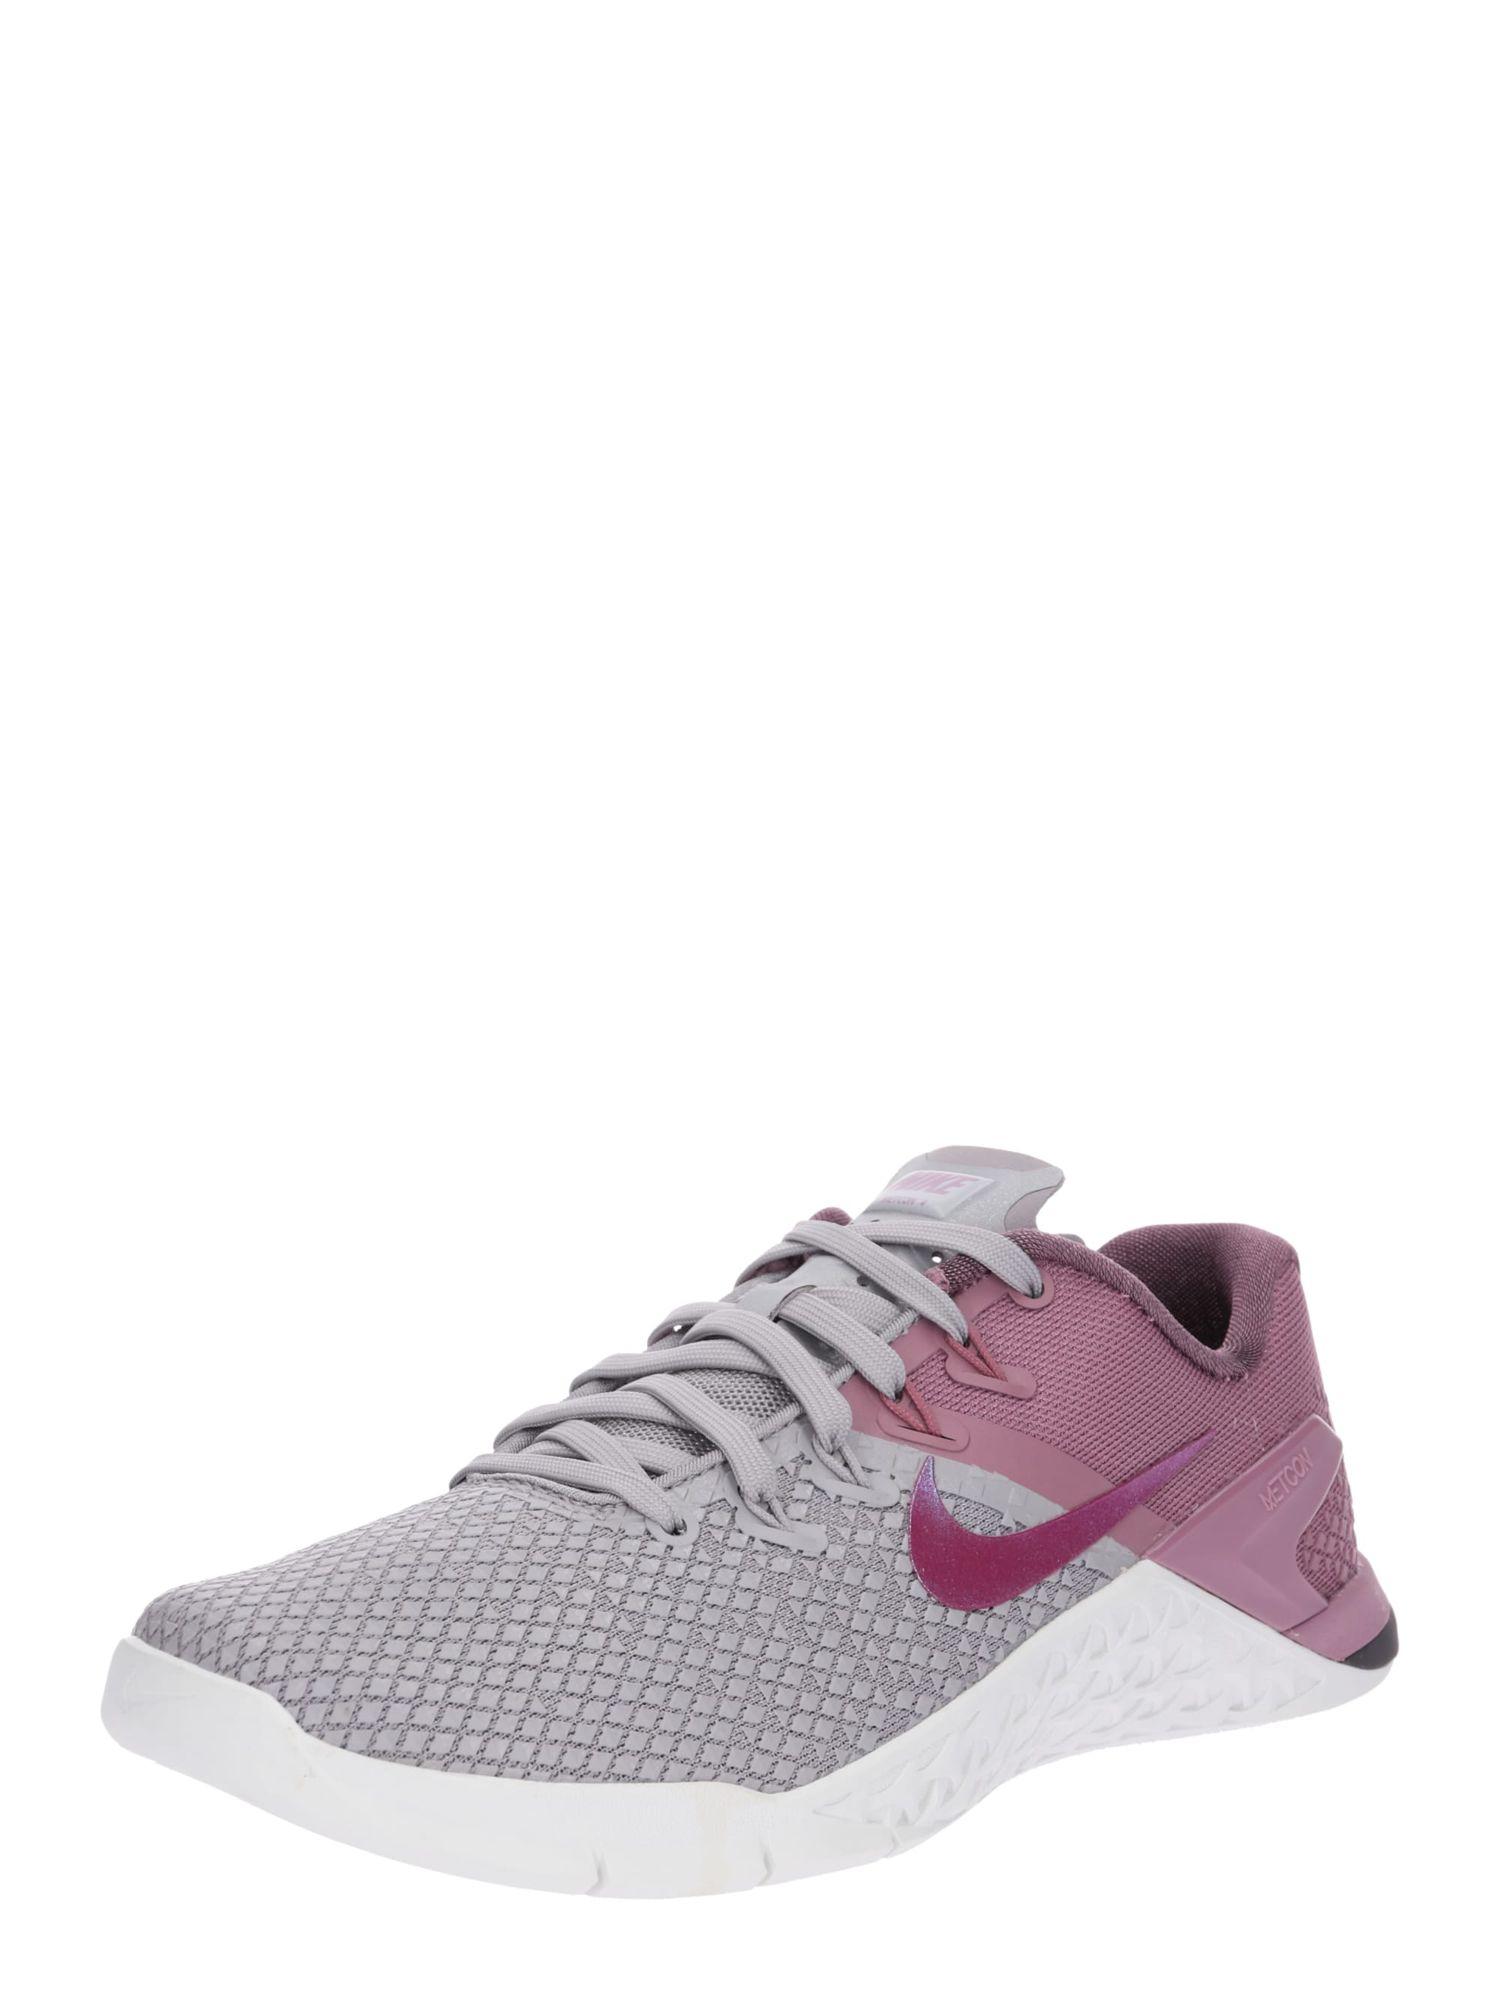 Sneaker ´WMNS NIKE METCON 4 XD´